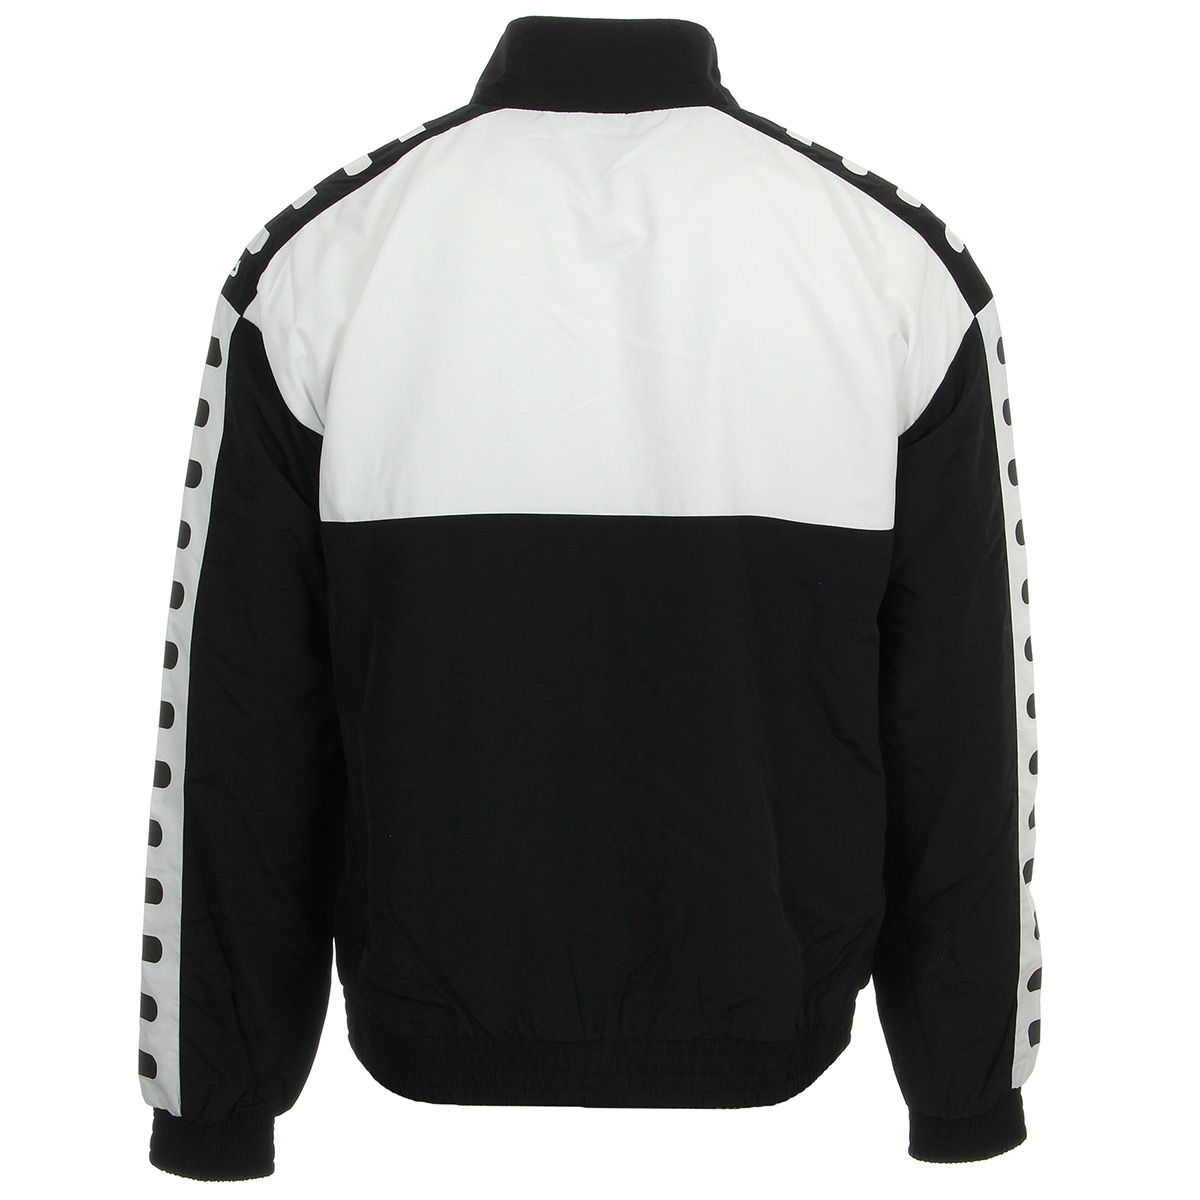 Fila Devin Woven Jacket 682165002, Vestes sport homme